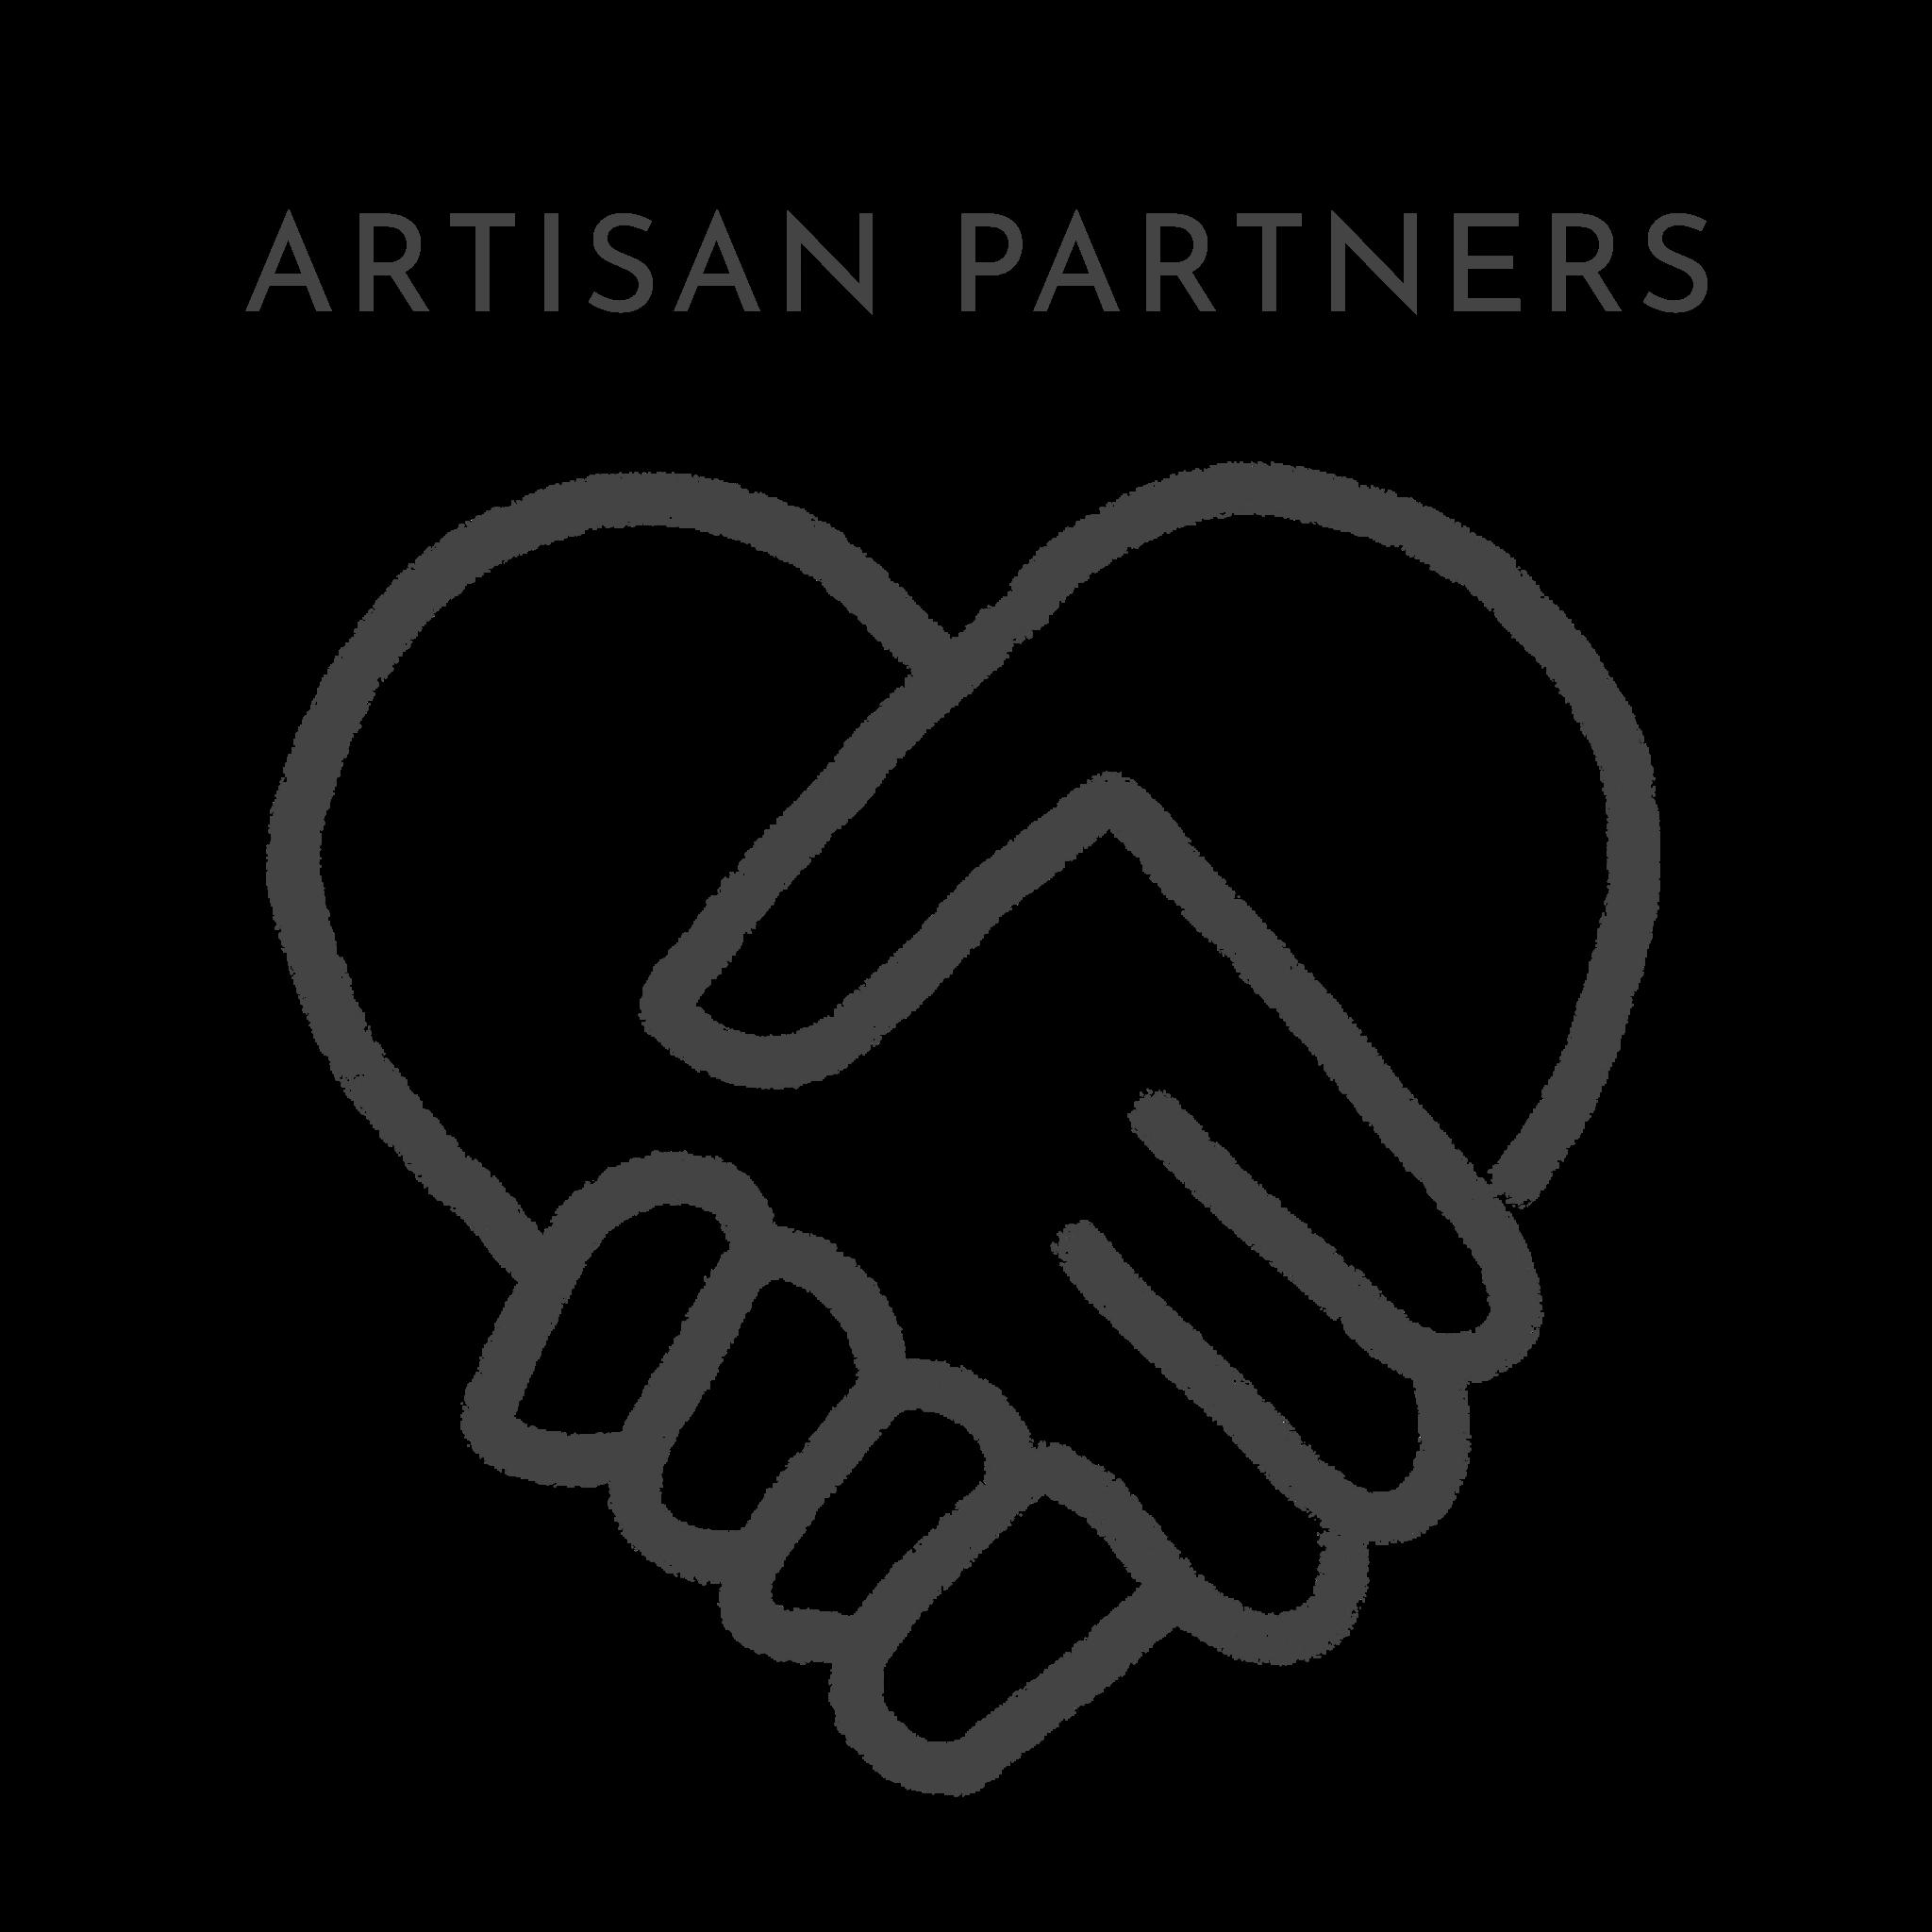 artisan-partners-icon-link